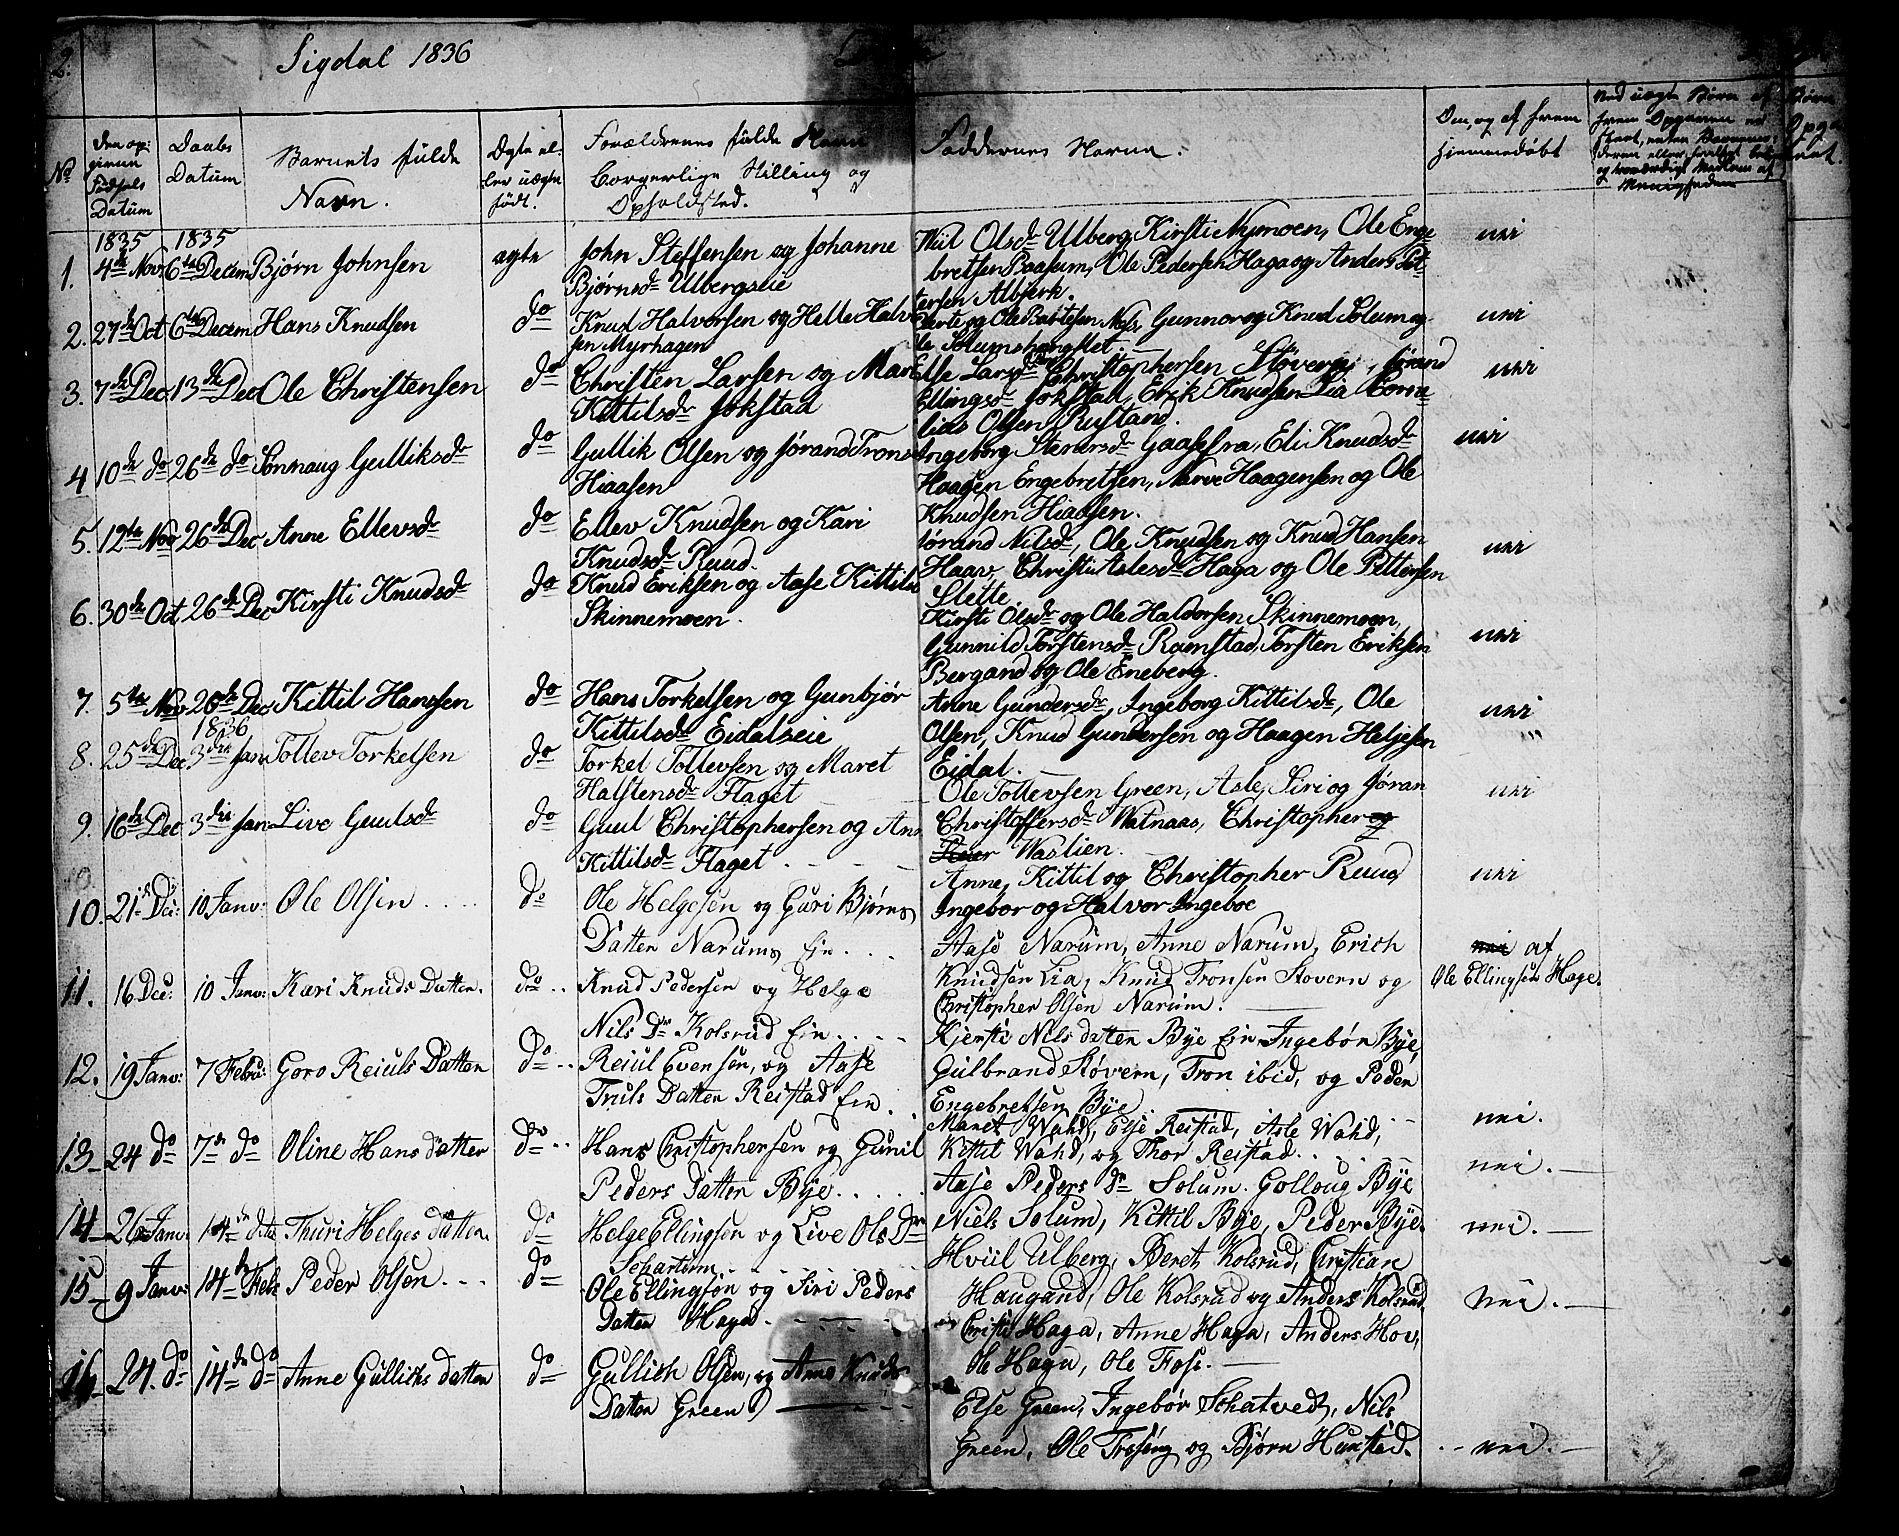 SAKO, Sigdal kirkebøker, G/Ga/L0002: Klokkerbok nr. I 2, 1835-1856, s. 2-3